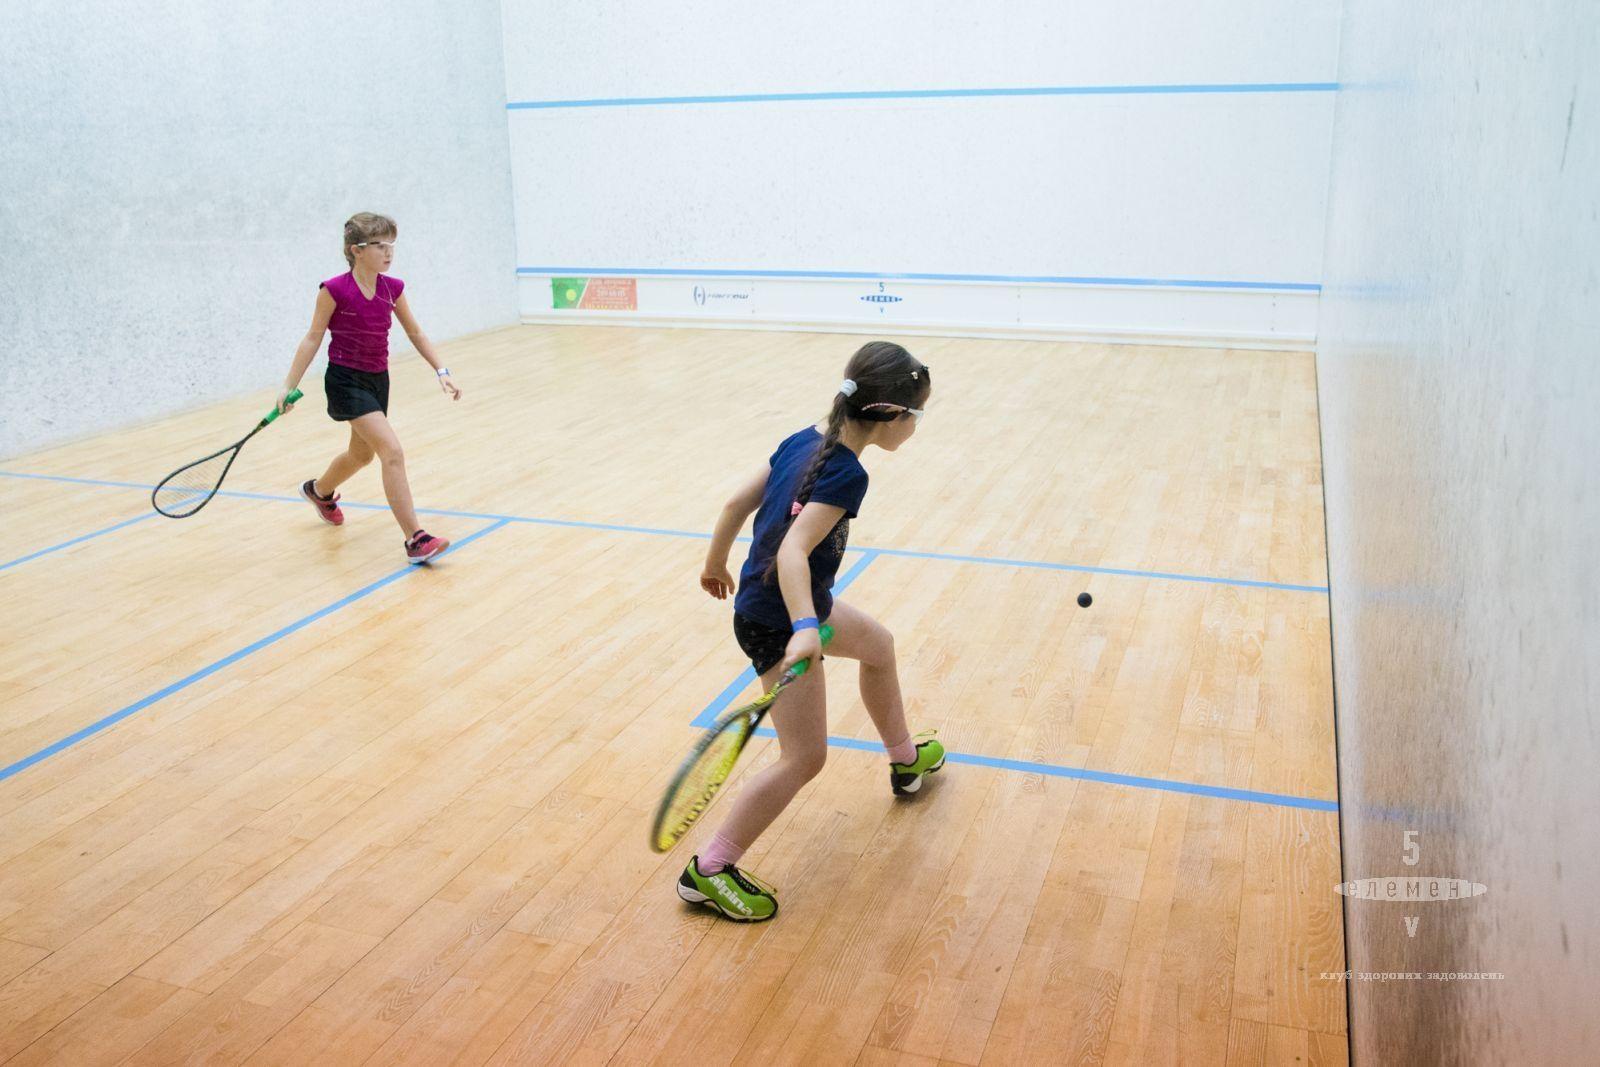 5 element junior squash cup— фитнес-клуб 5 элемент